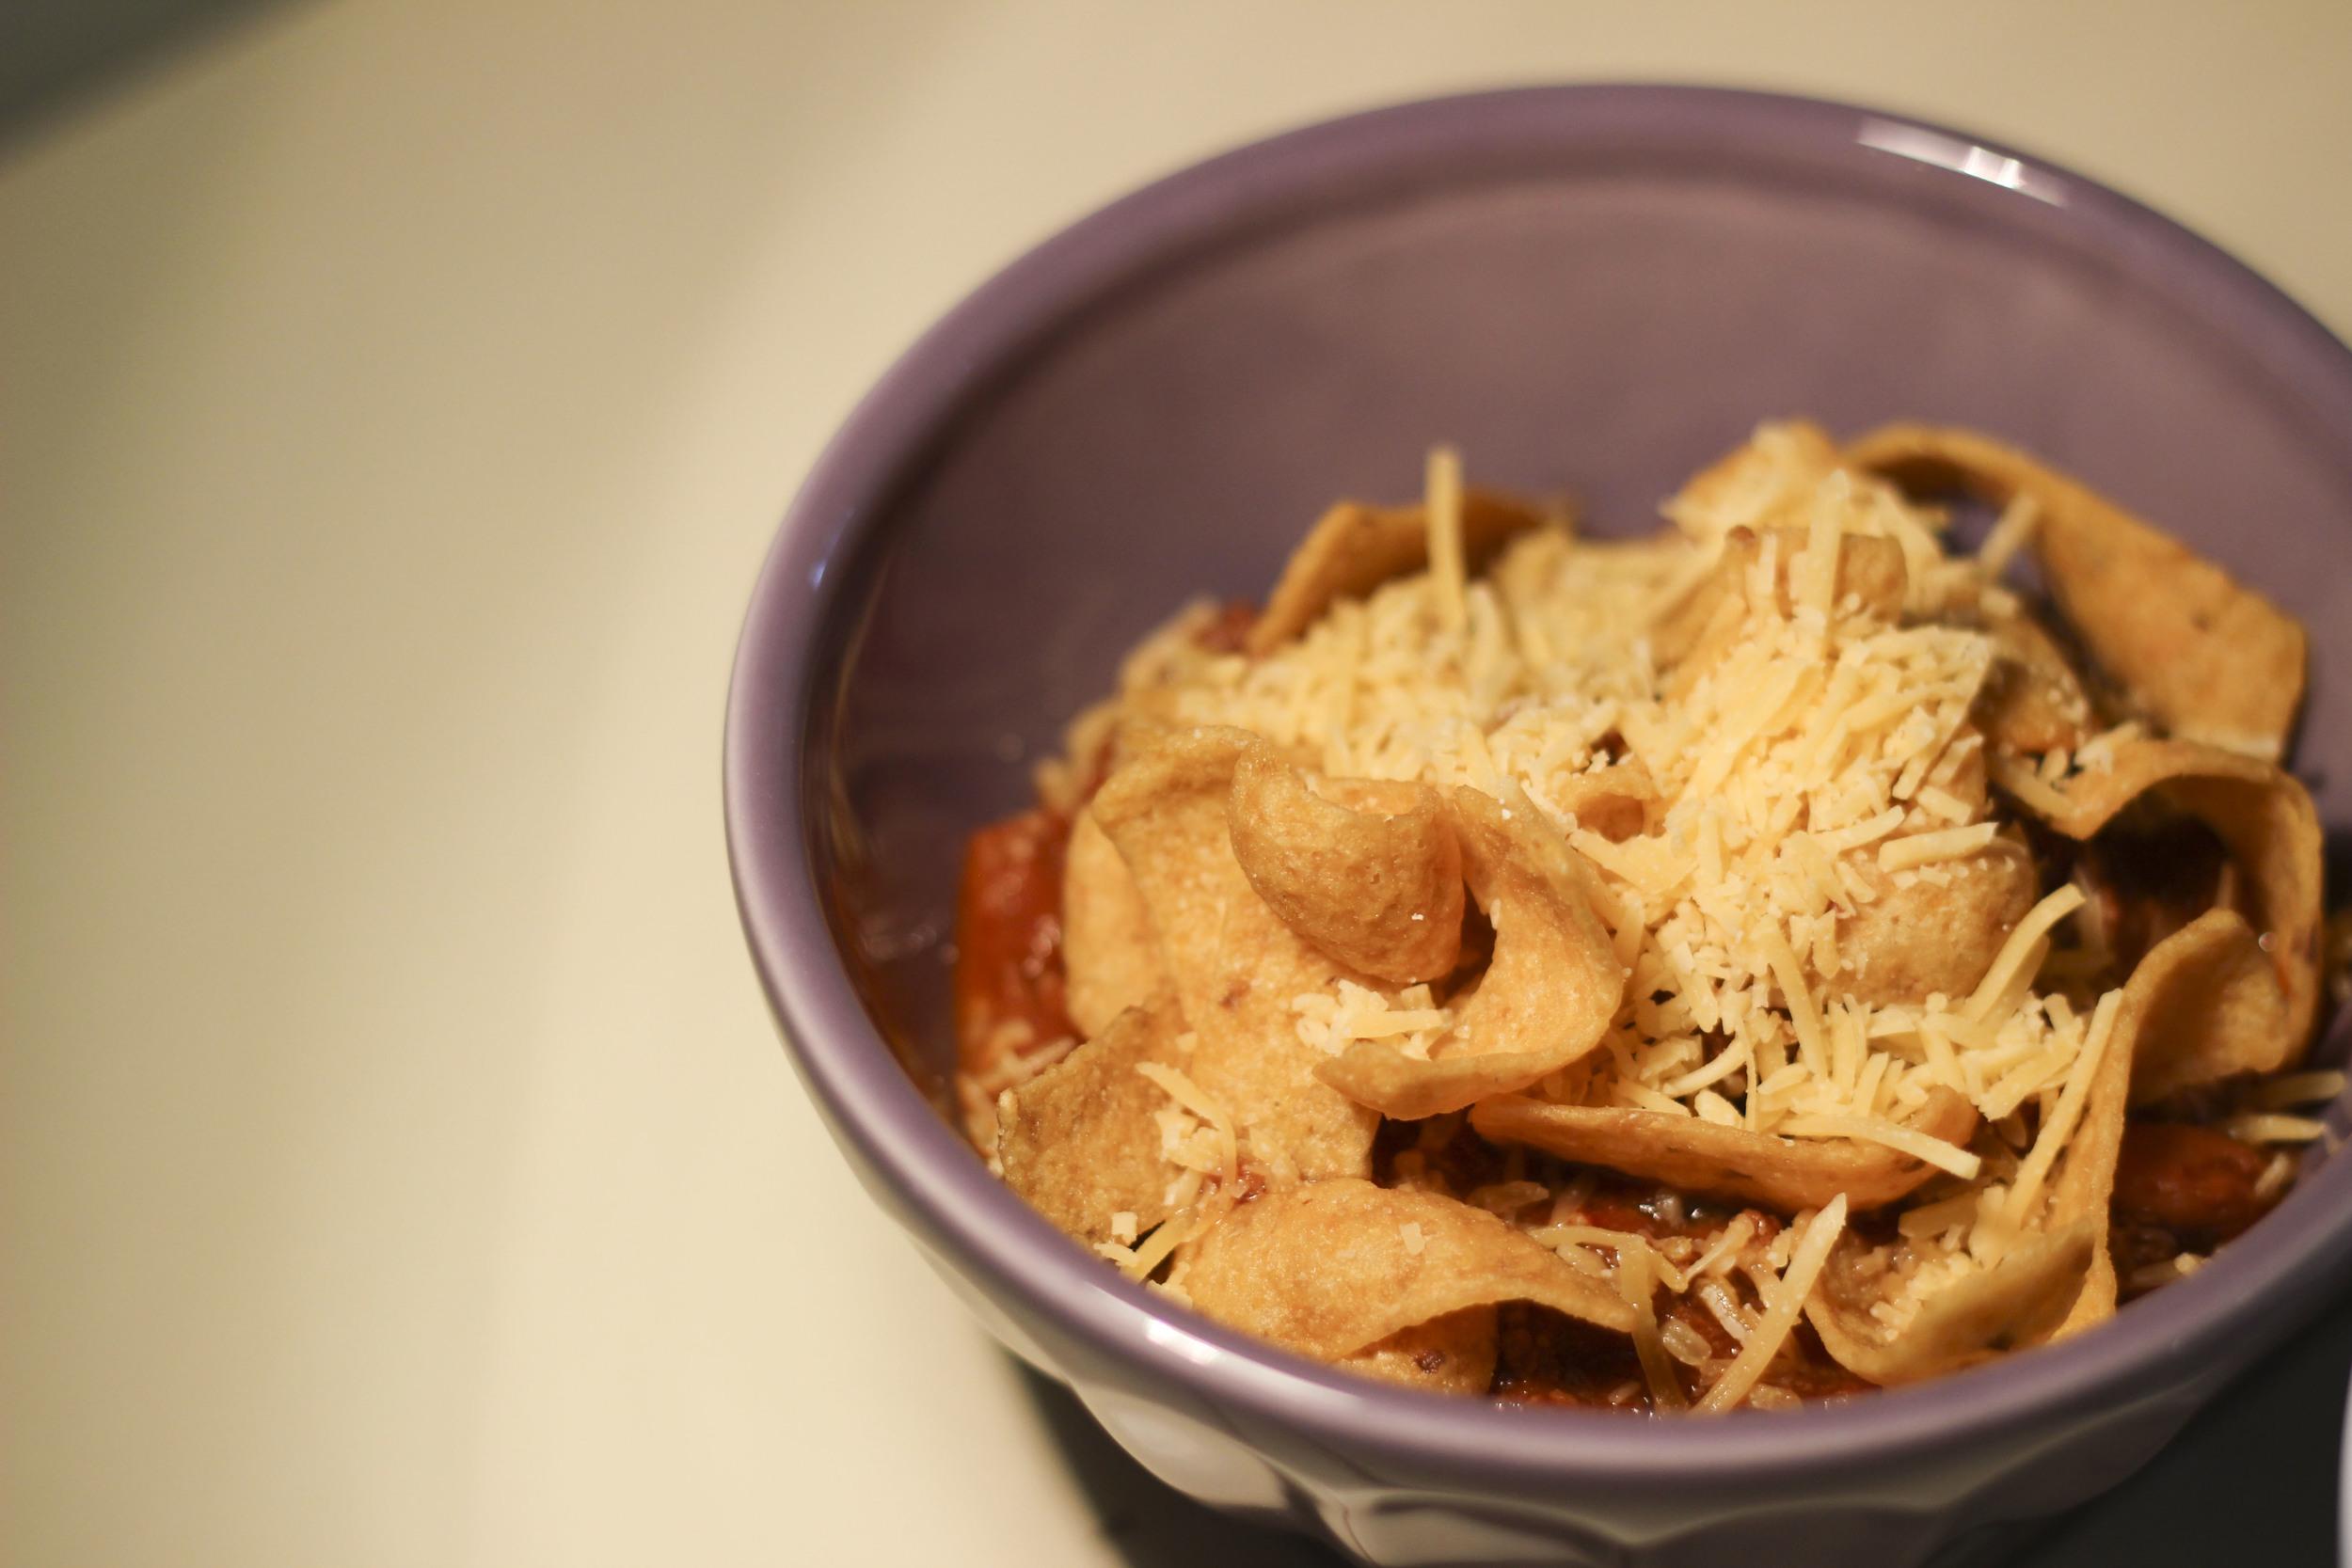 101813_chili bowl_1.jpg